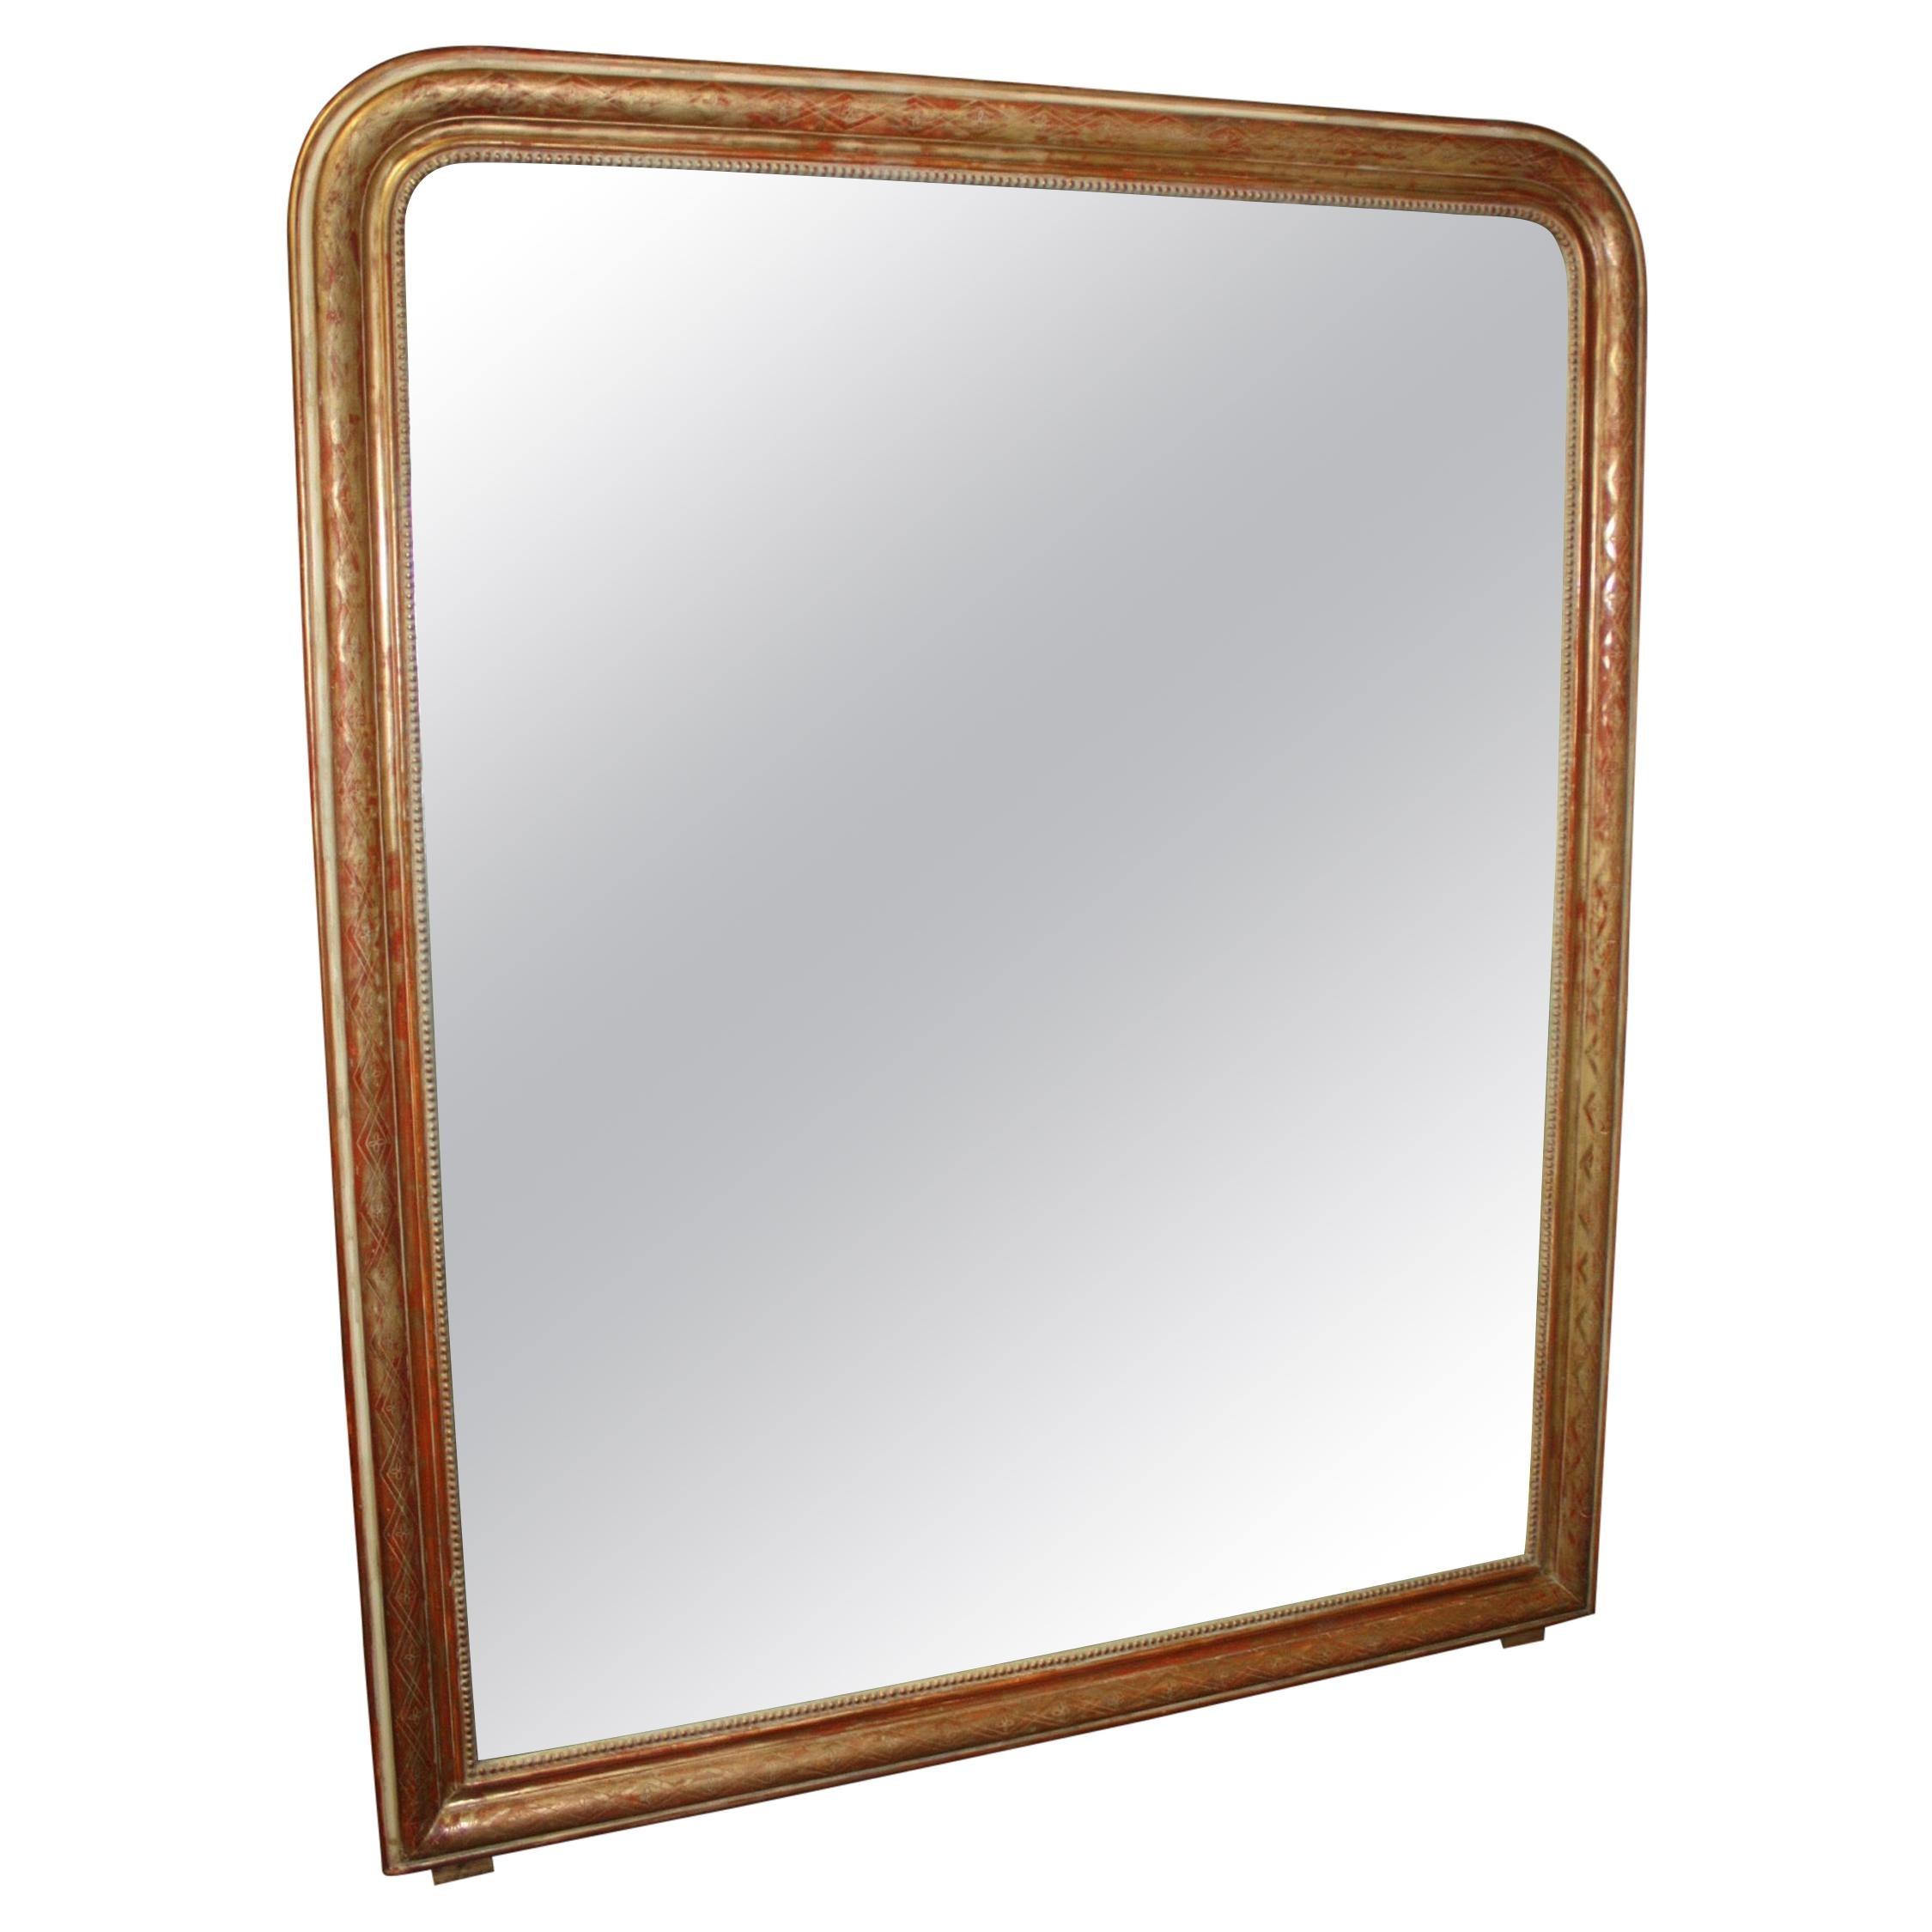 Louis-Philippe Period Mirror, 19th Century